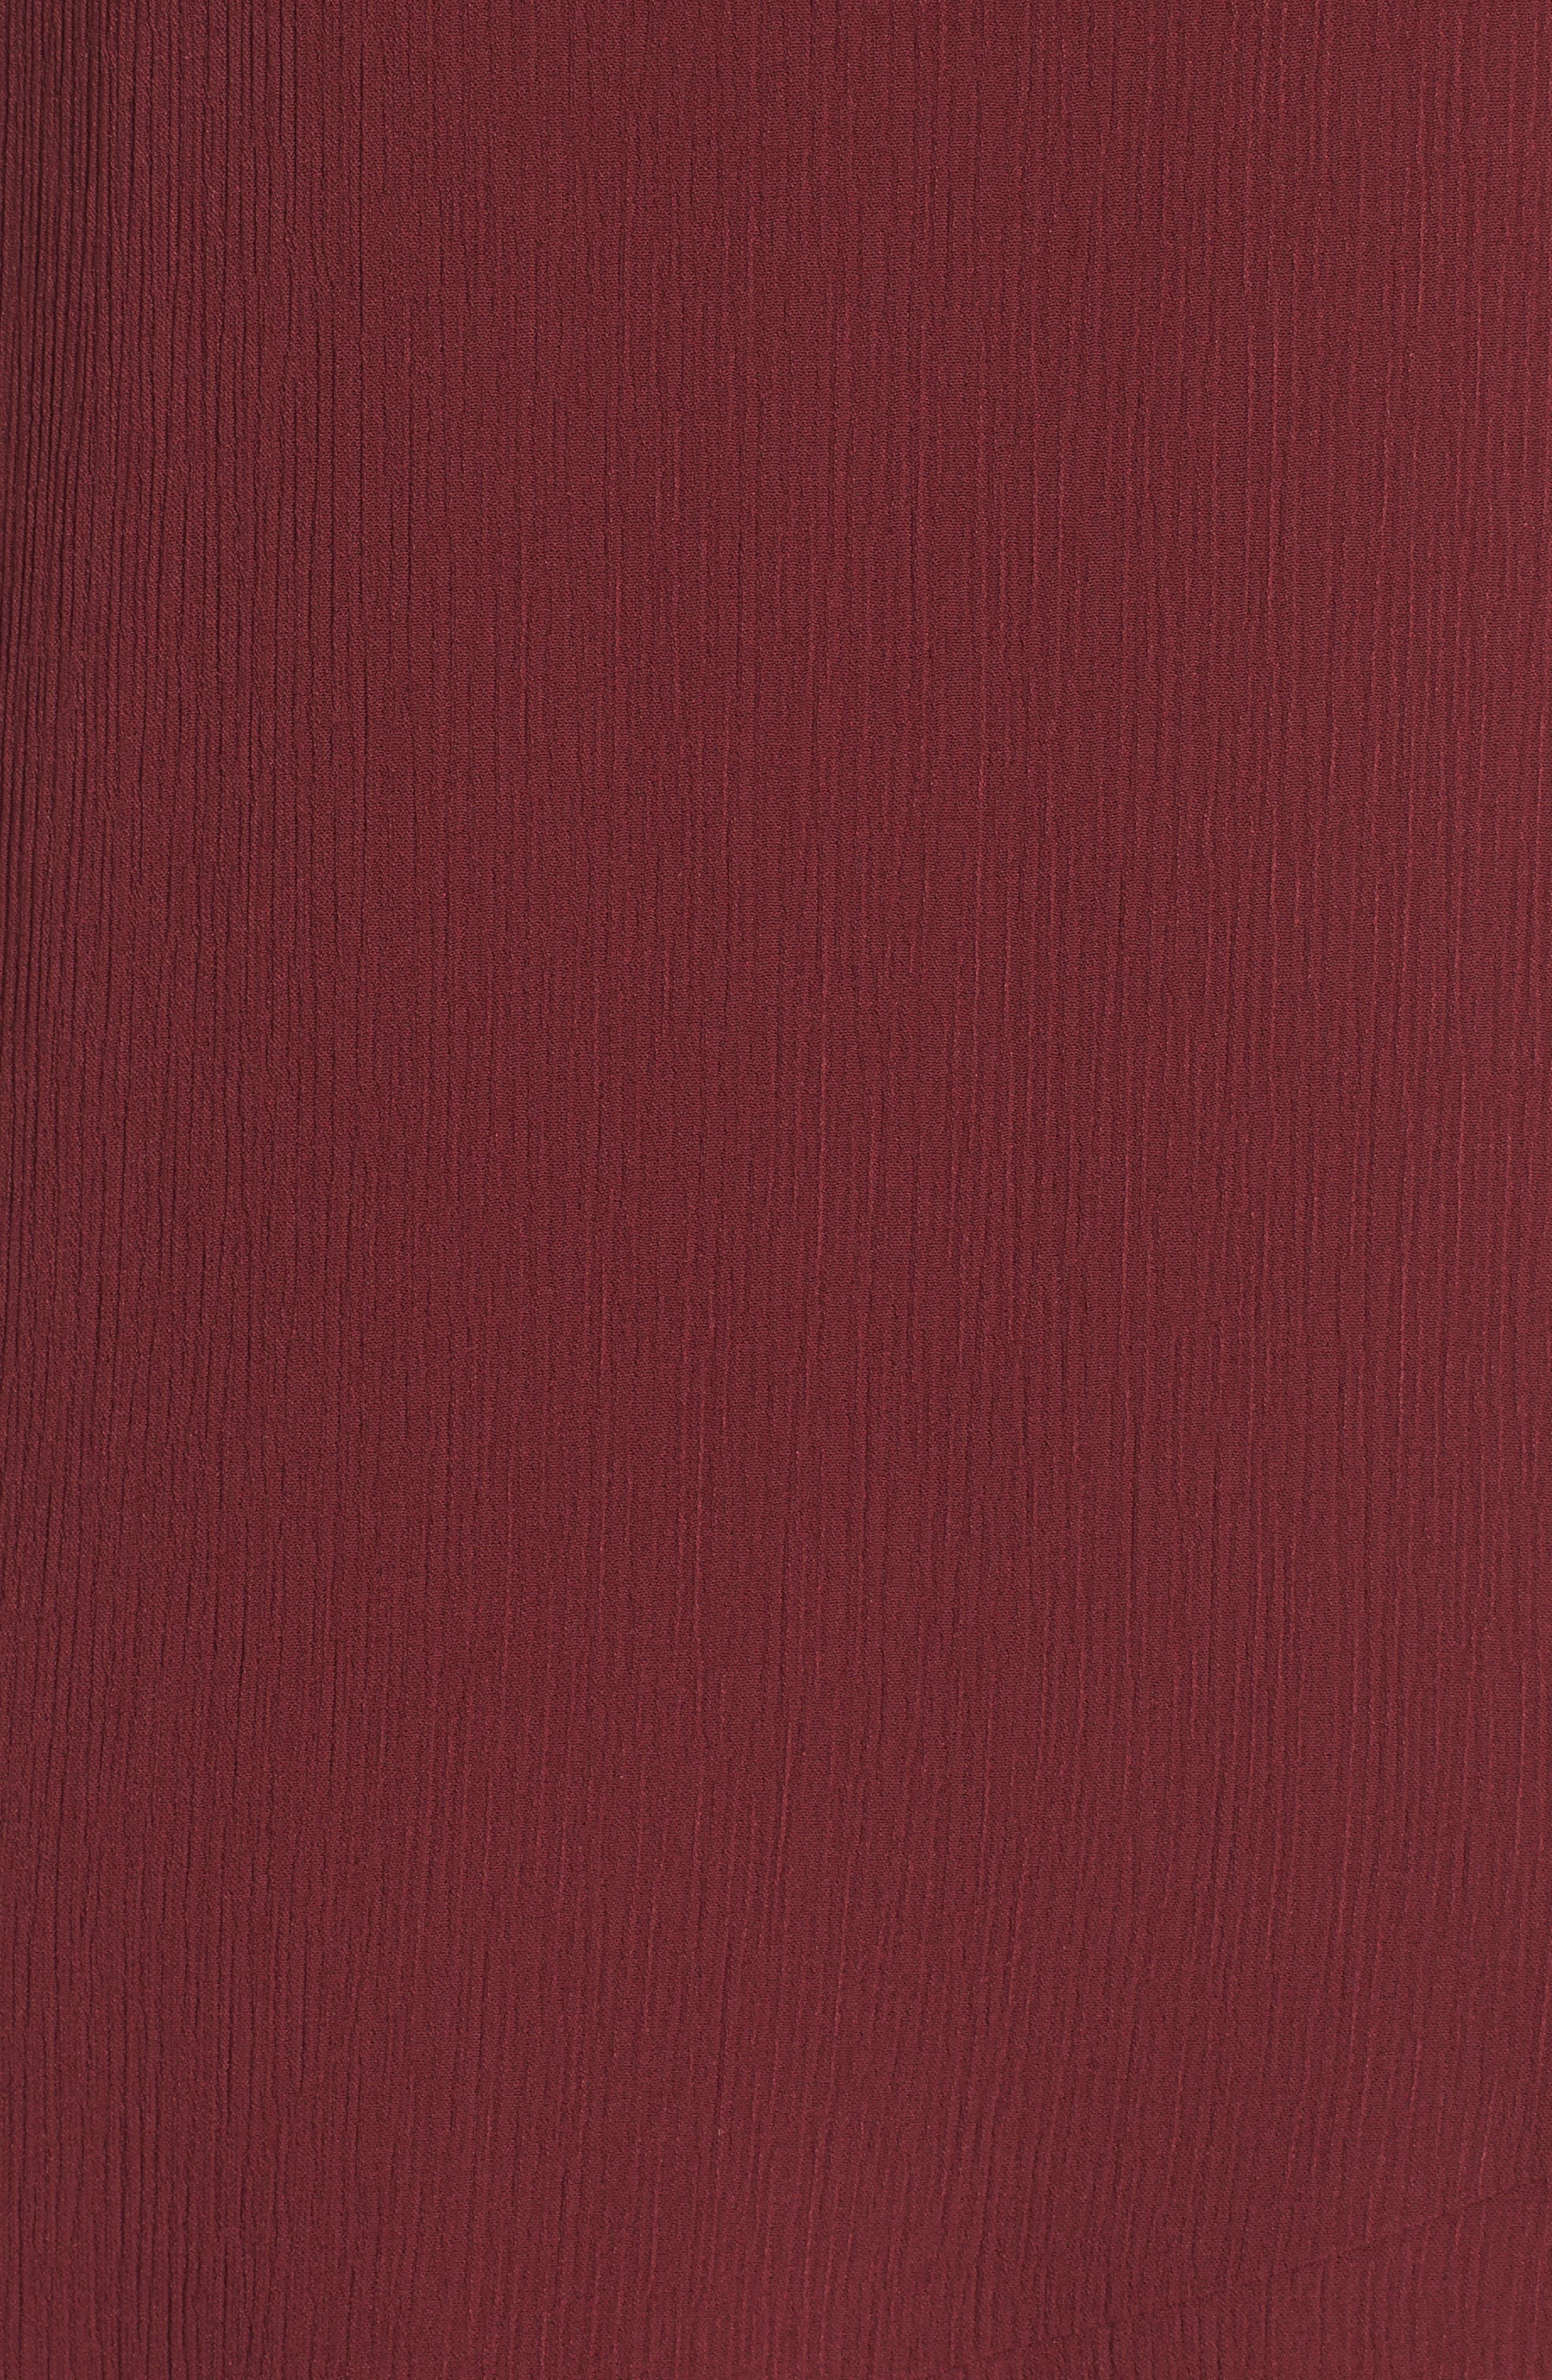 Asymmetrical Ruffle Hem Dress,                             Alternate thumbnail 5, color,                             Red Tannin